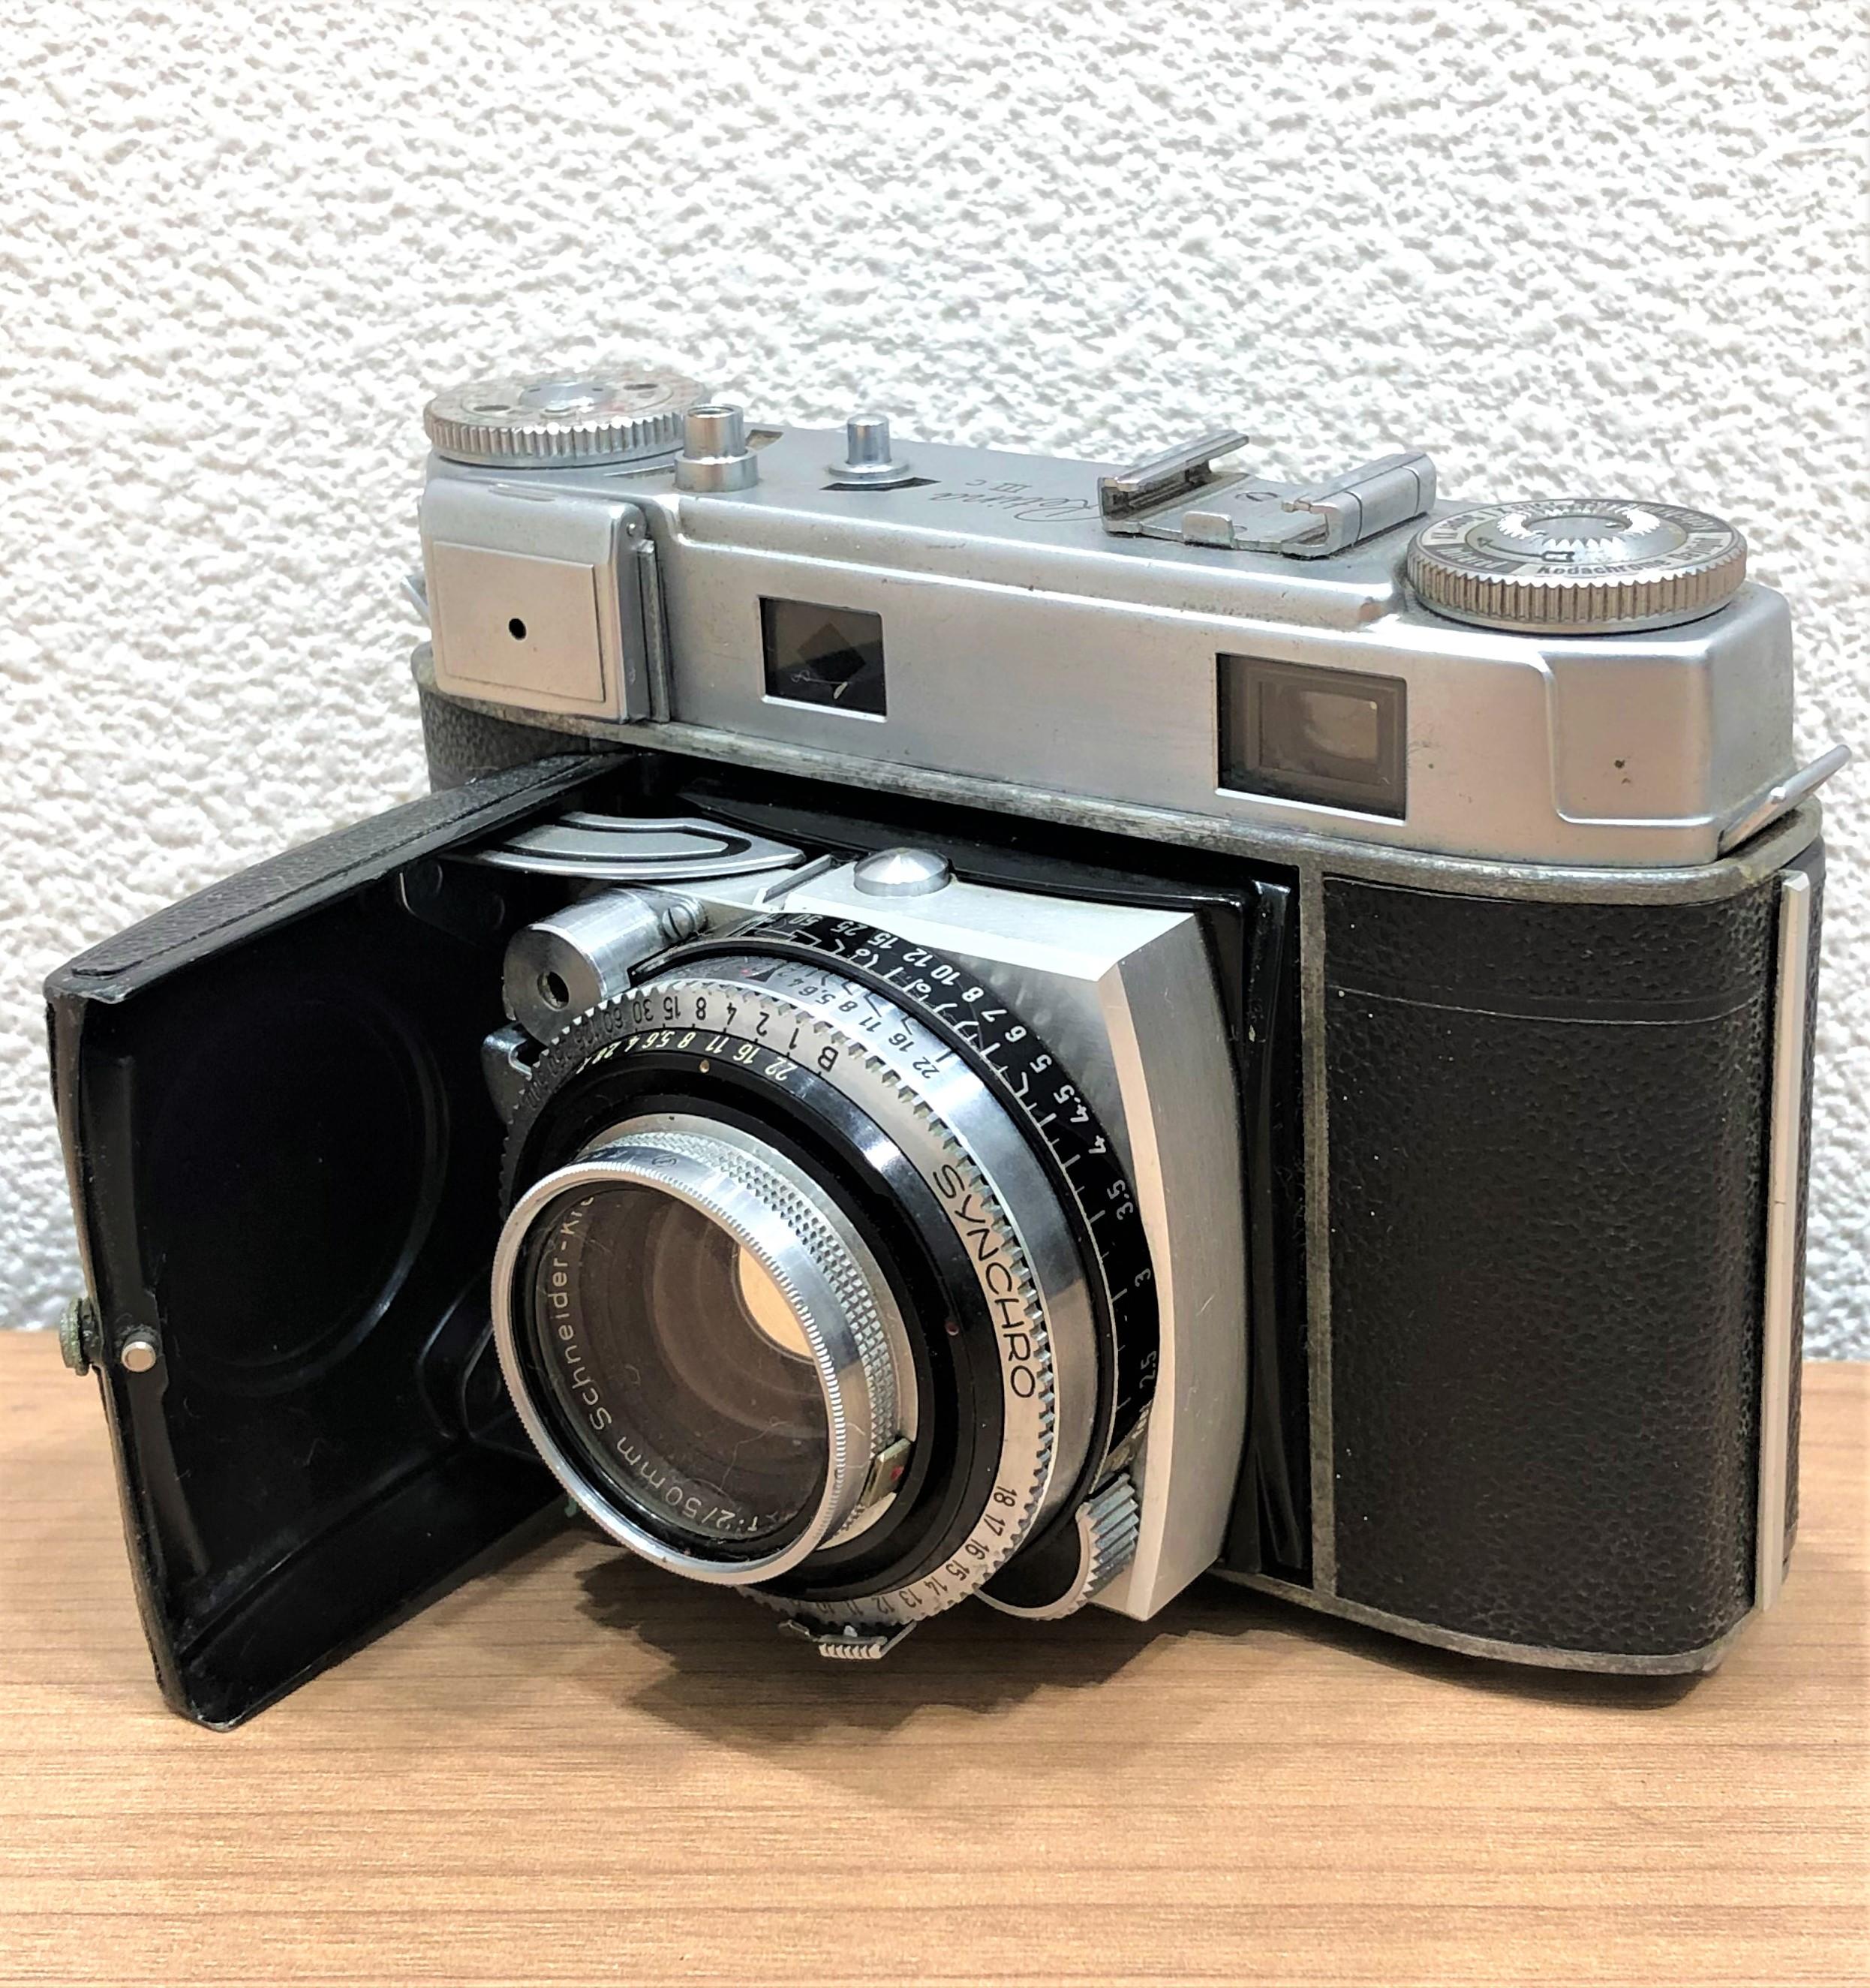 【Kodak/コダック】RetinaⅢc フィルムカメラ